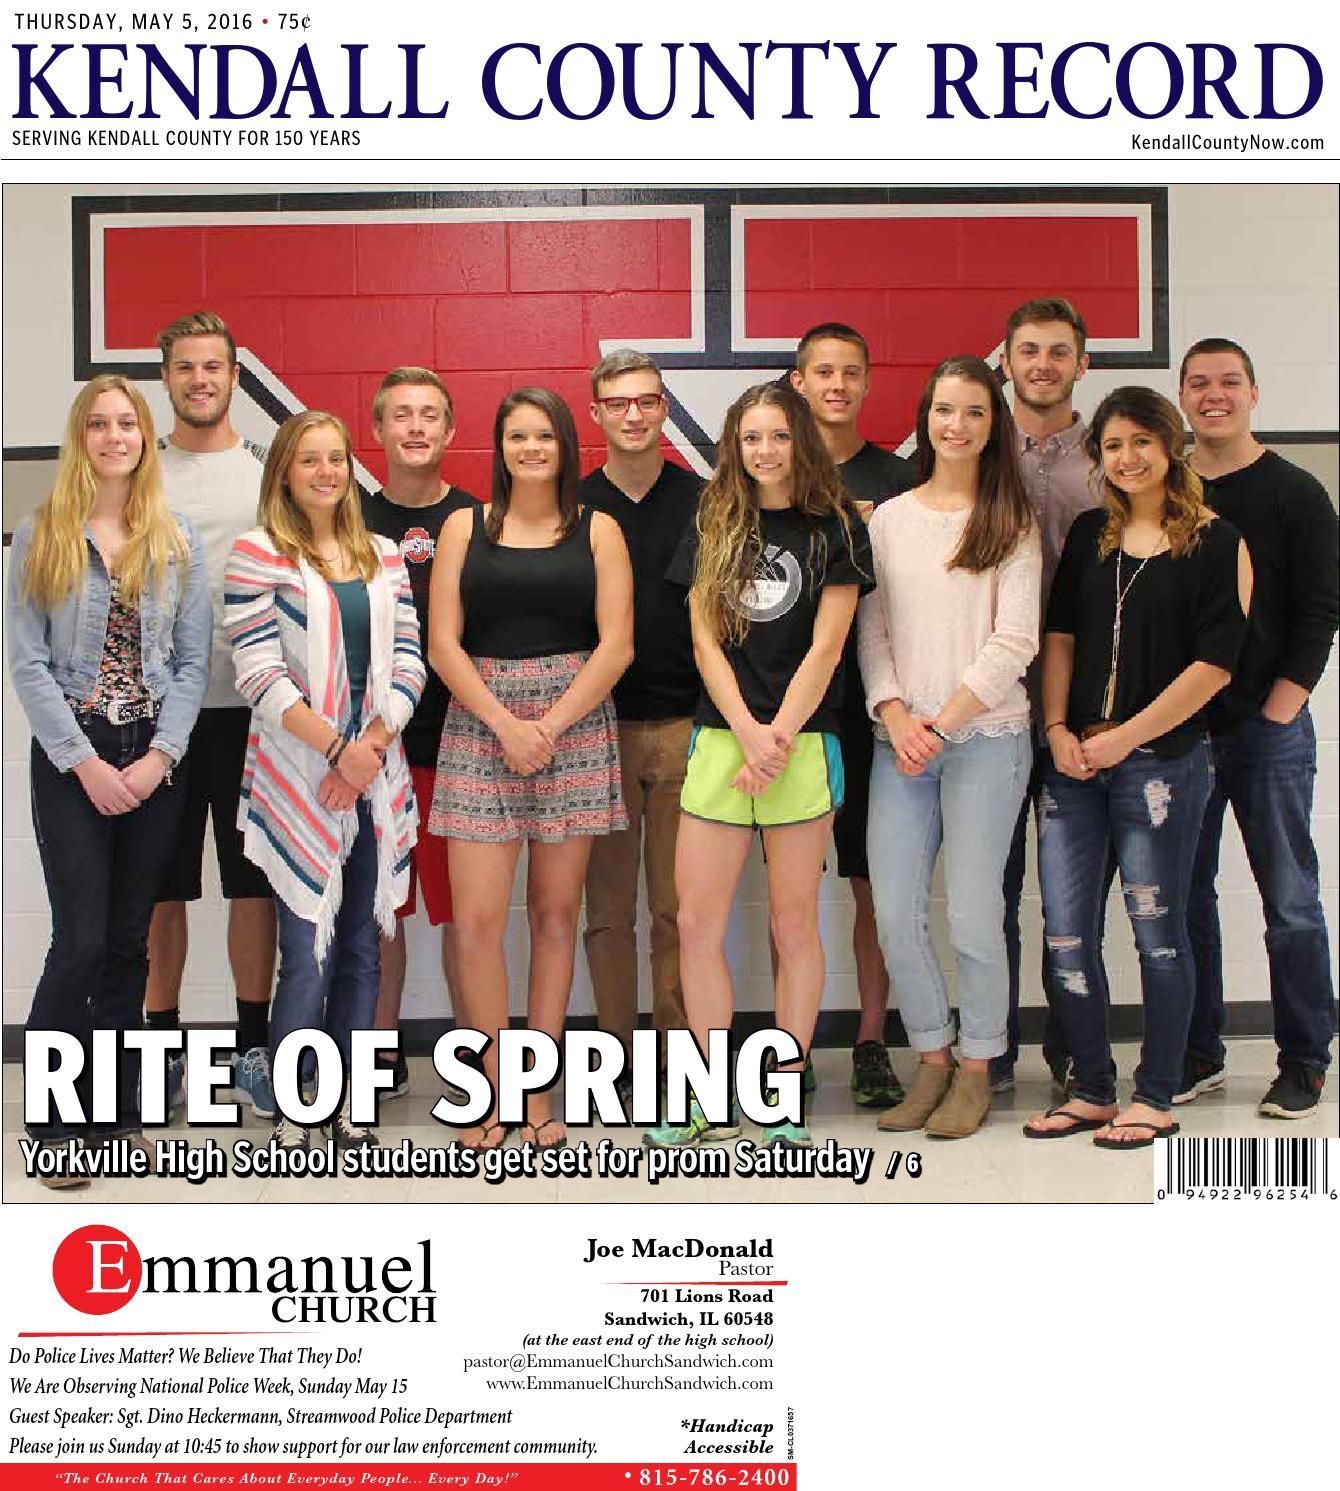 Illinois kendall county oswego - Illinois Kendall County Oswego 78